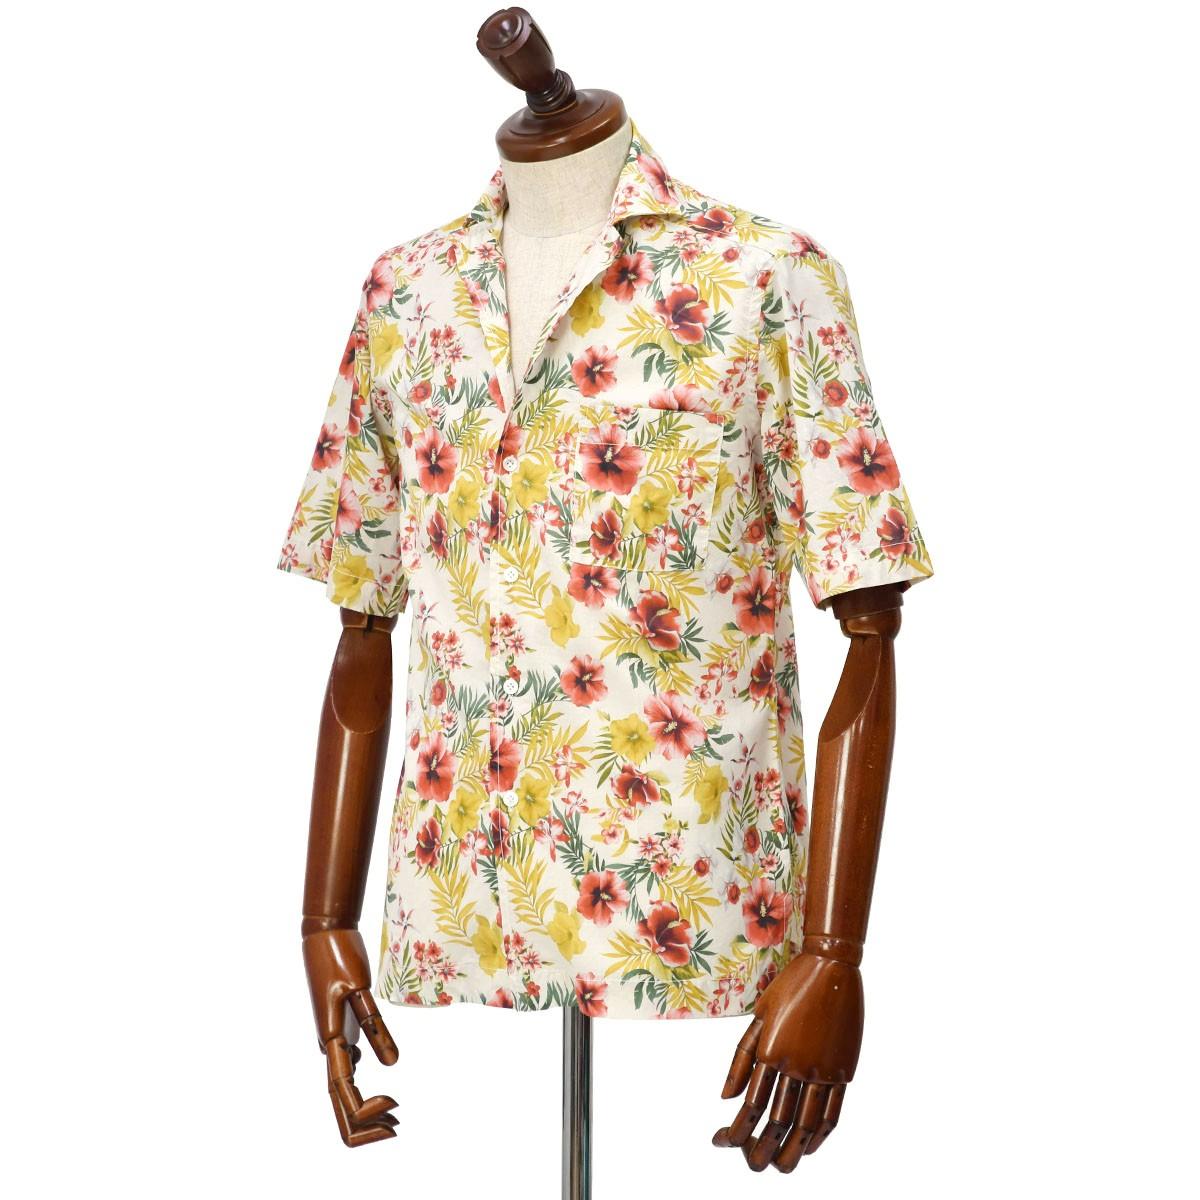 Bagutta【バグッタ】オープンカラーシャツをご紹介致します!!